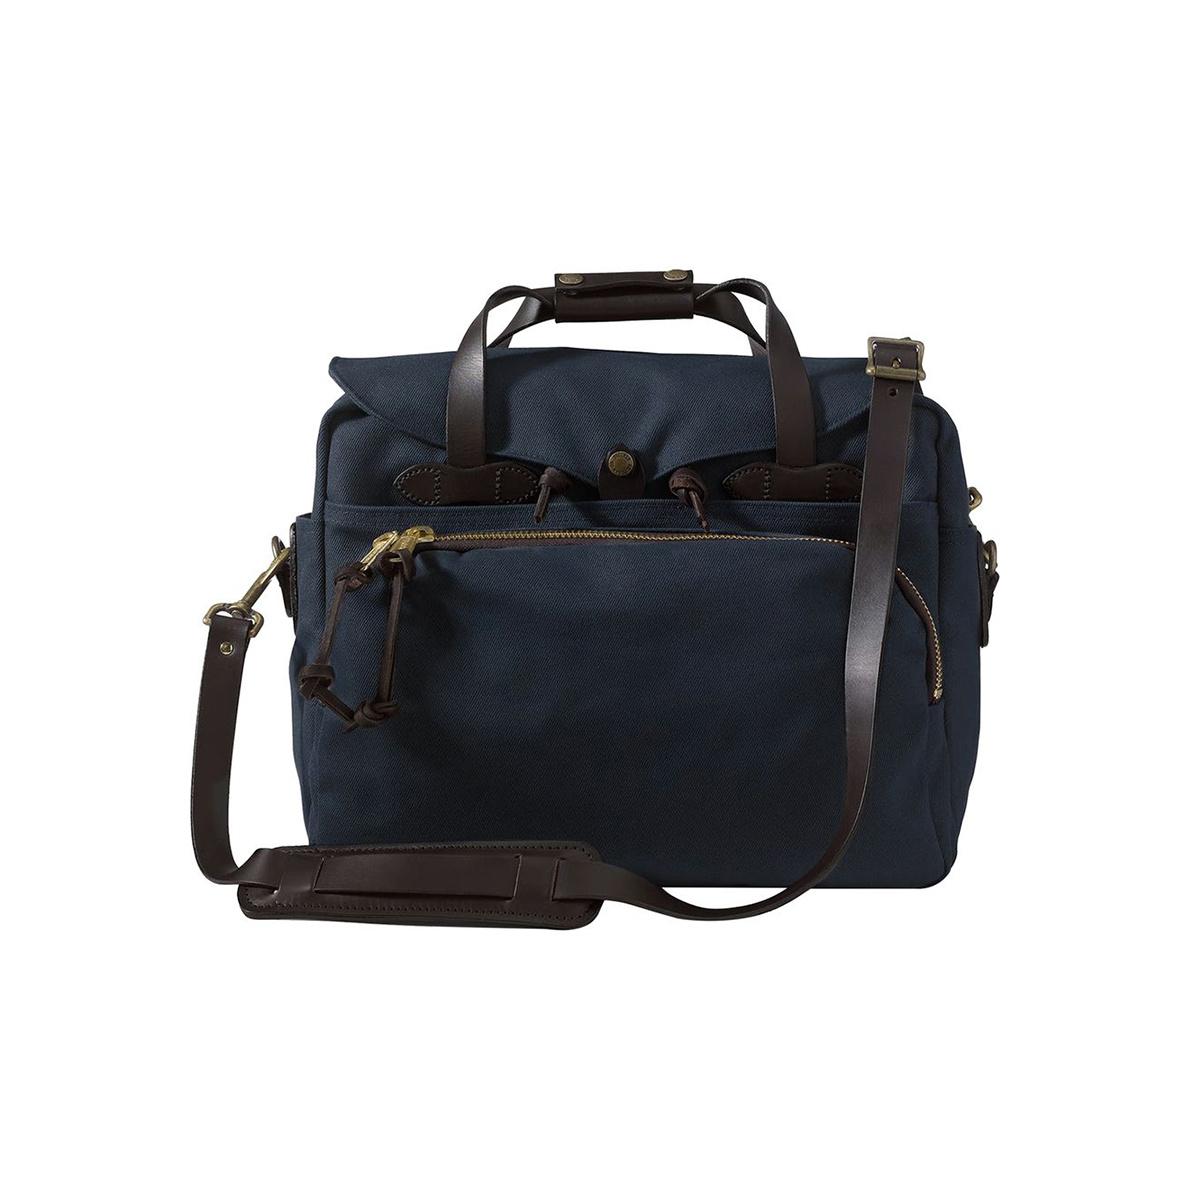 62f724d500b8 Filson Padded Computer Bag